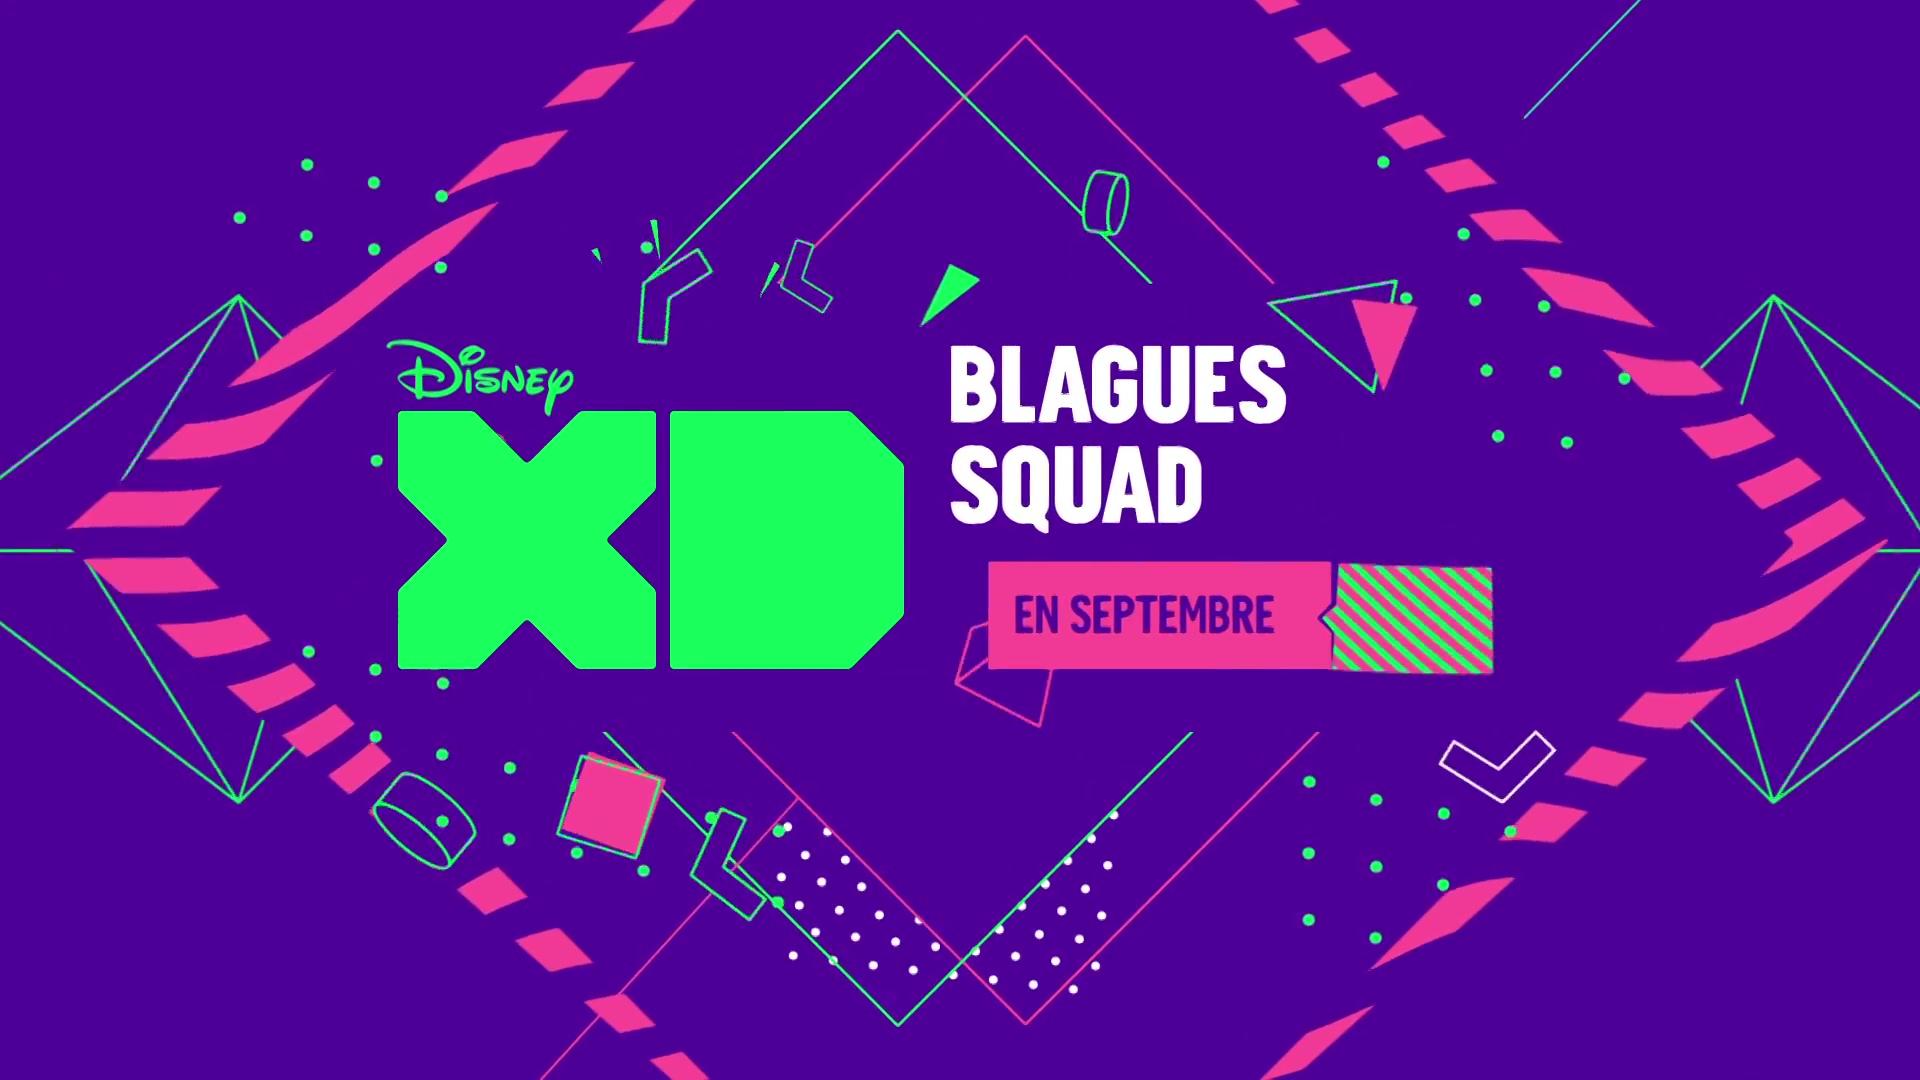 Disney XD Blagues Squad